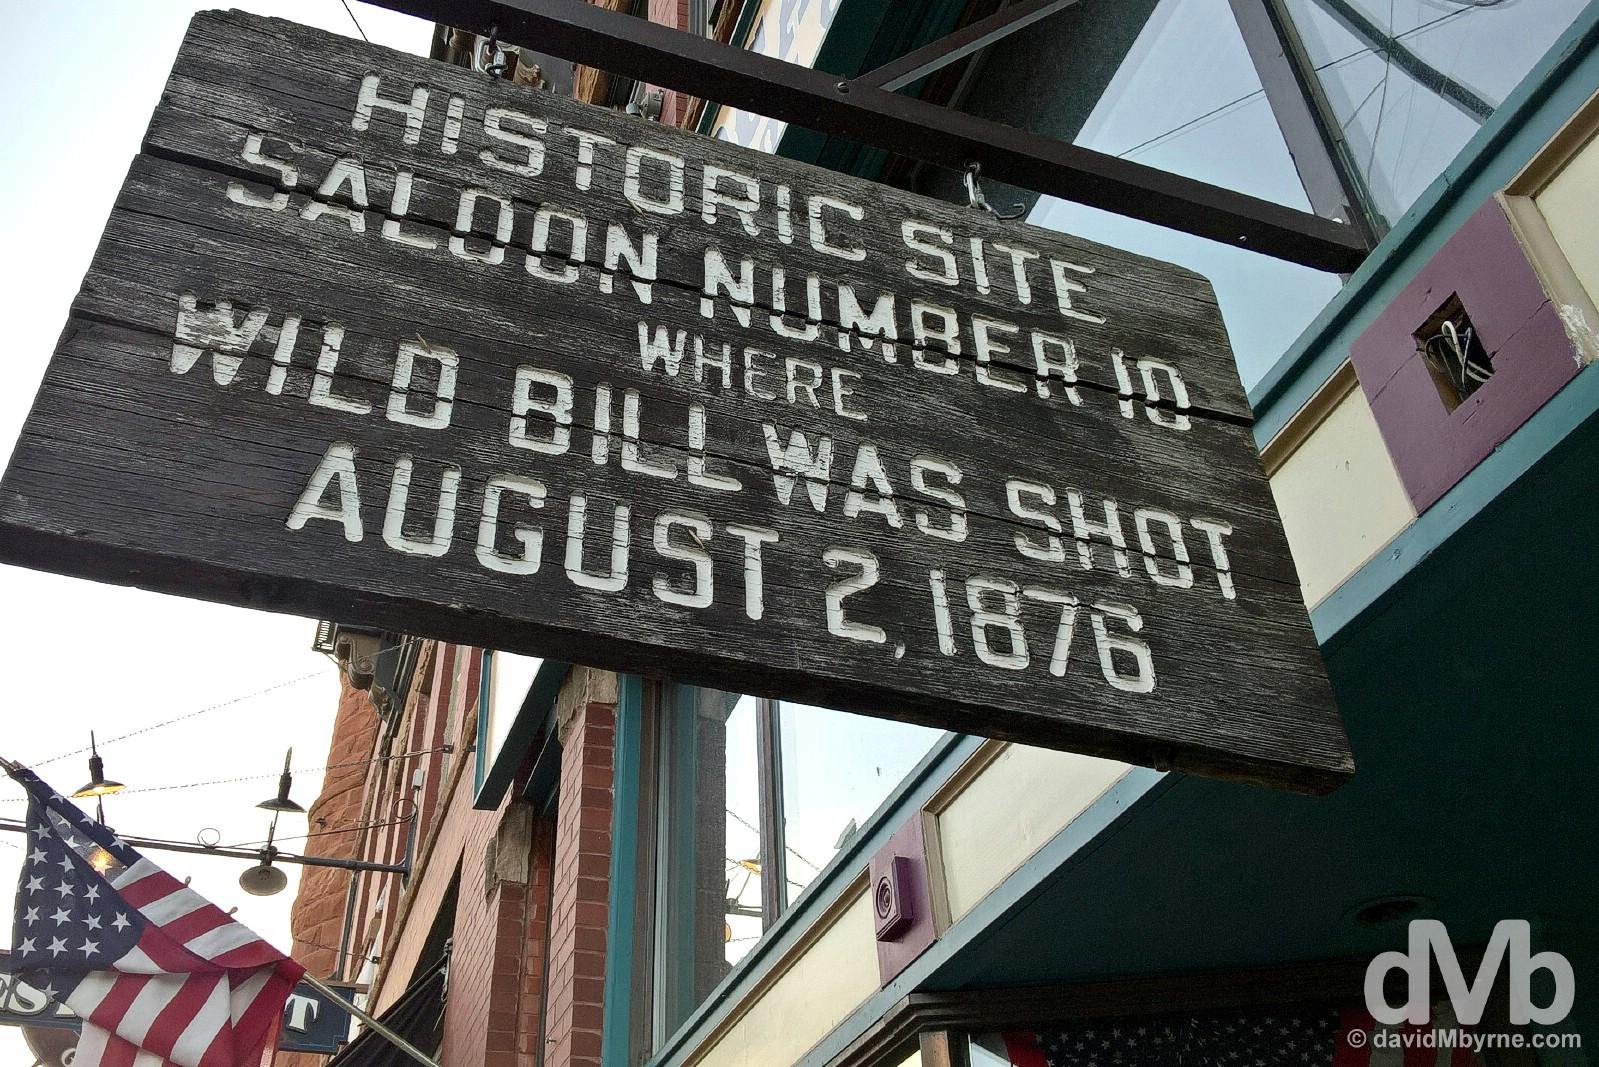 Saloon Number 10, Historic Main Street Deadwood, Black Hills, South Dakota, USA. September 1, 2016.